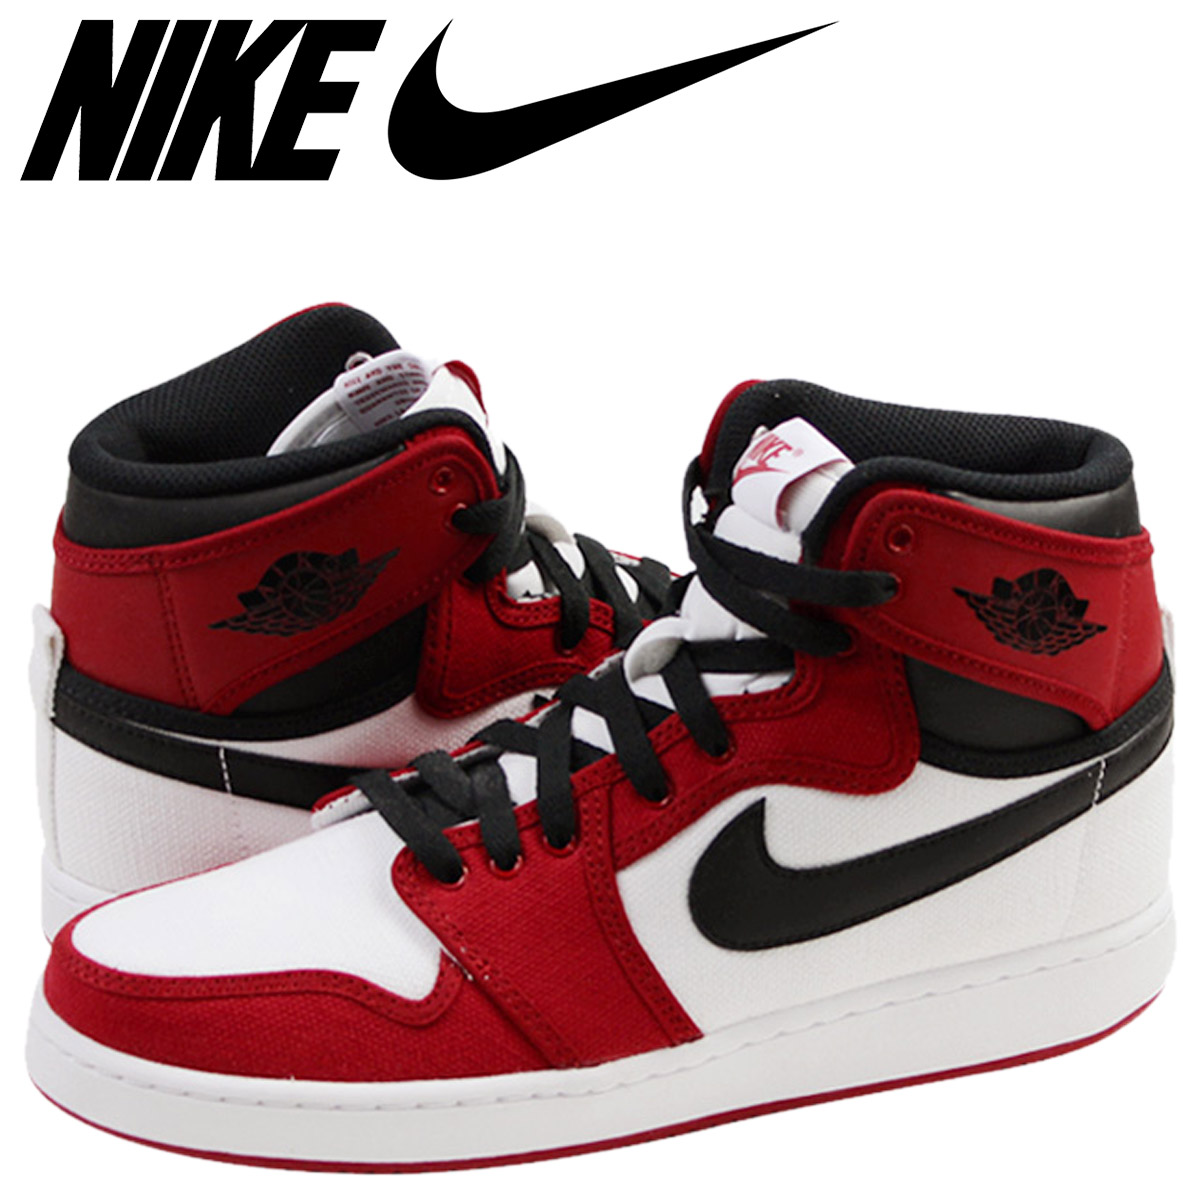 b72abb1b4a2 NIKE Nike Air Jordan sneakers AIR JORDAN 1 RETRO KO HIGH CHICAGO Air Jordan  1 nostalgic